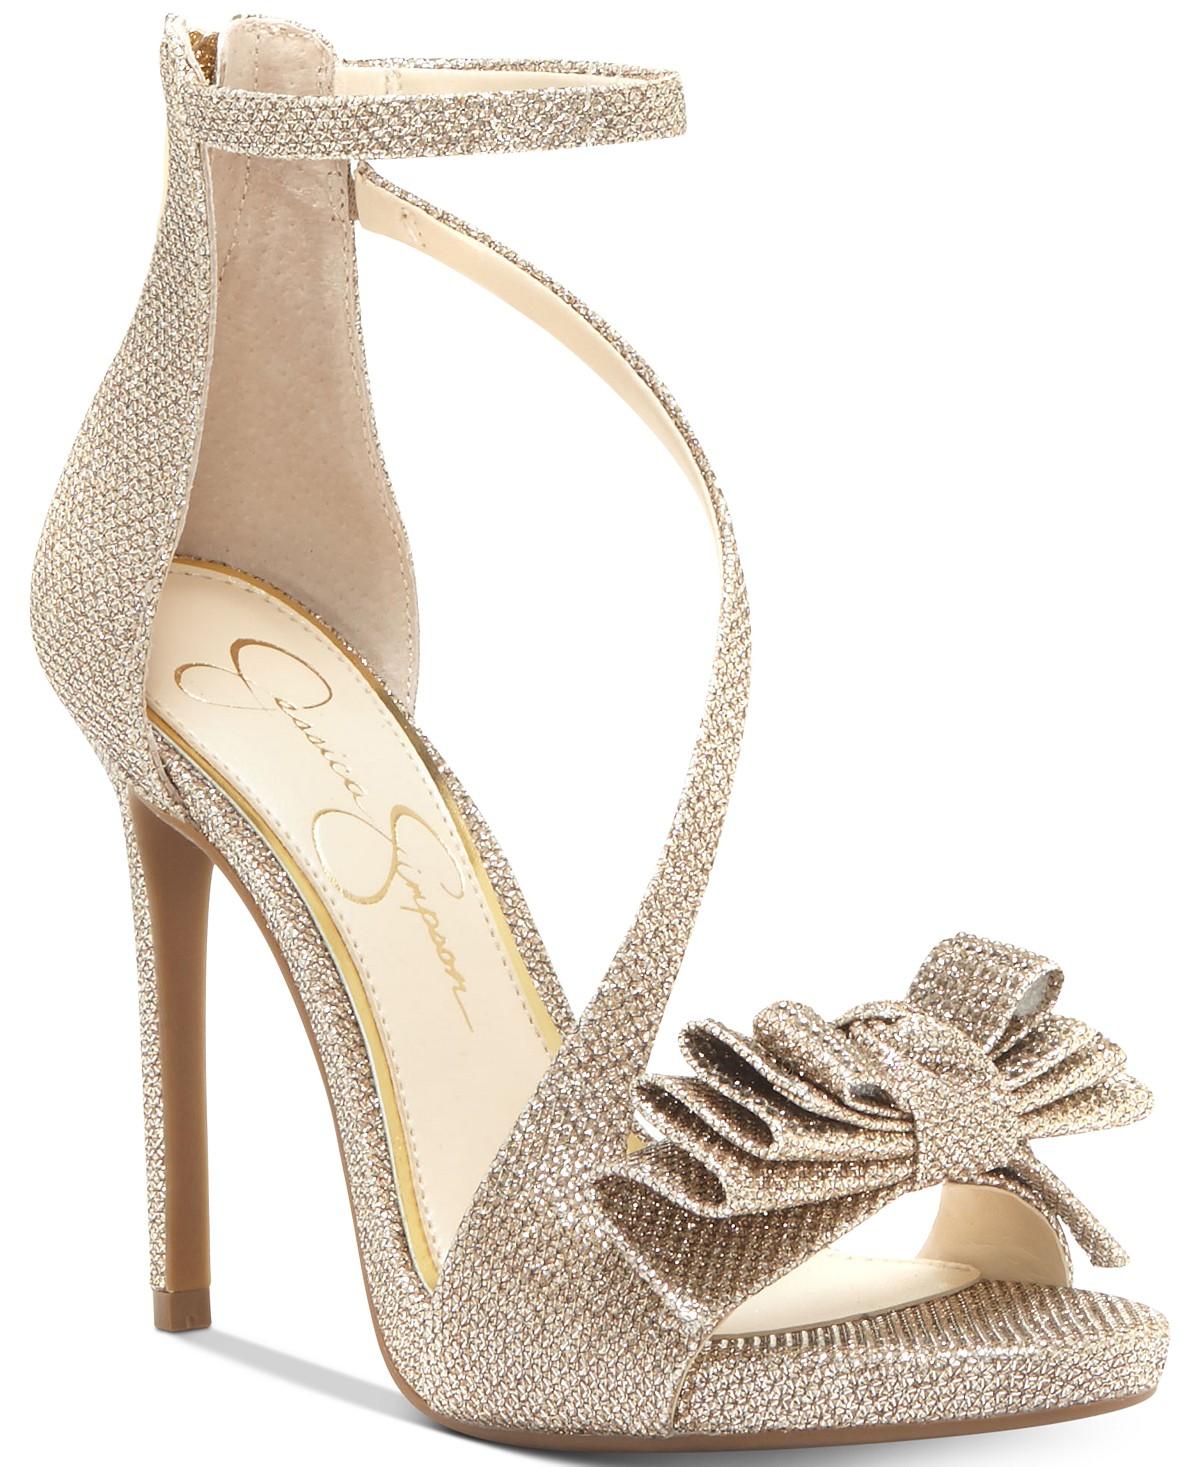 Jessica Simpson Remyia Bow Dress Sandals | Hermosaz